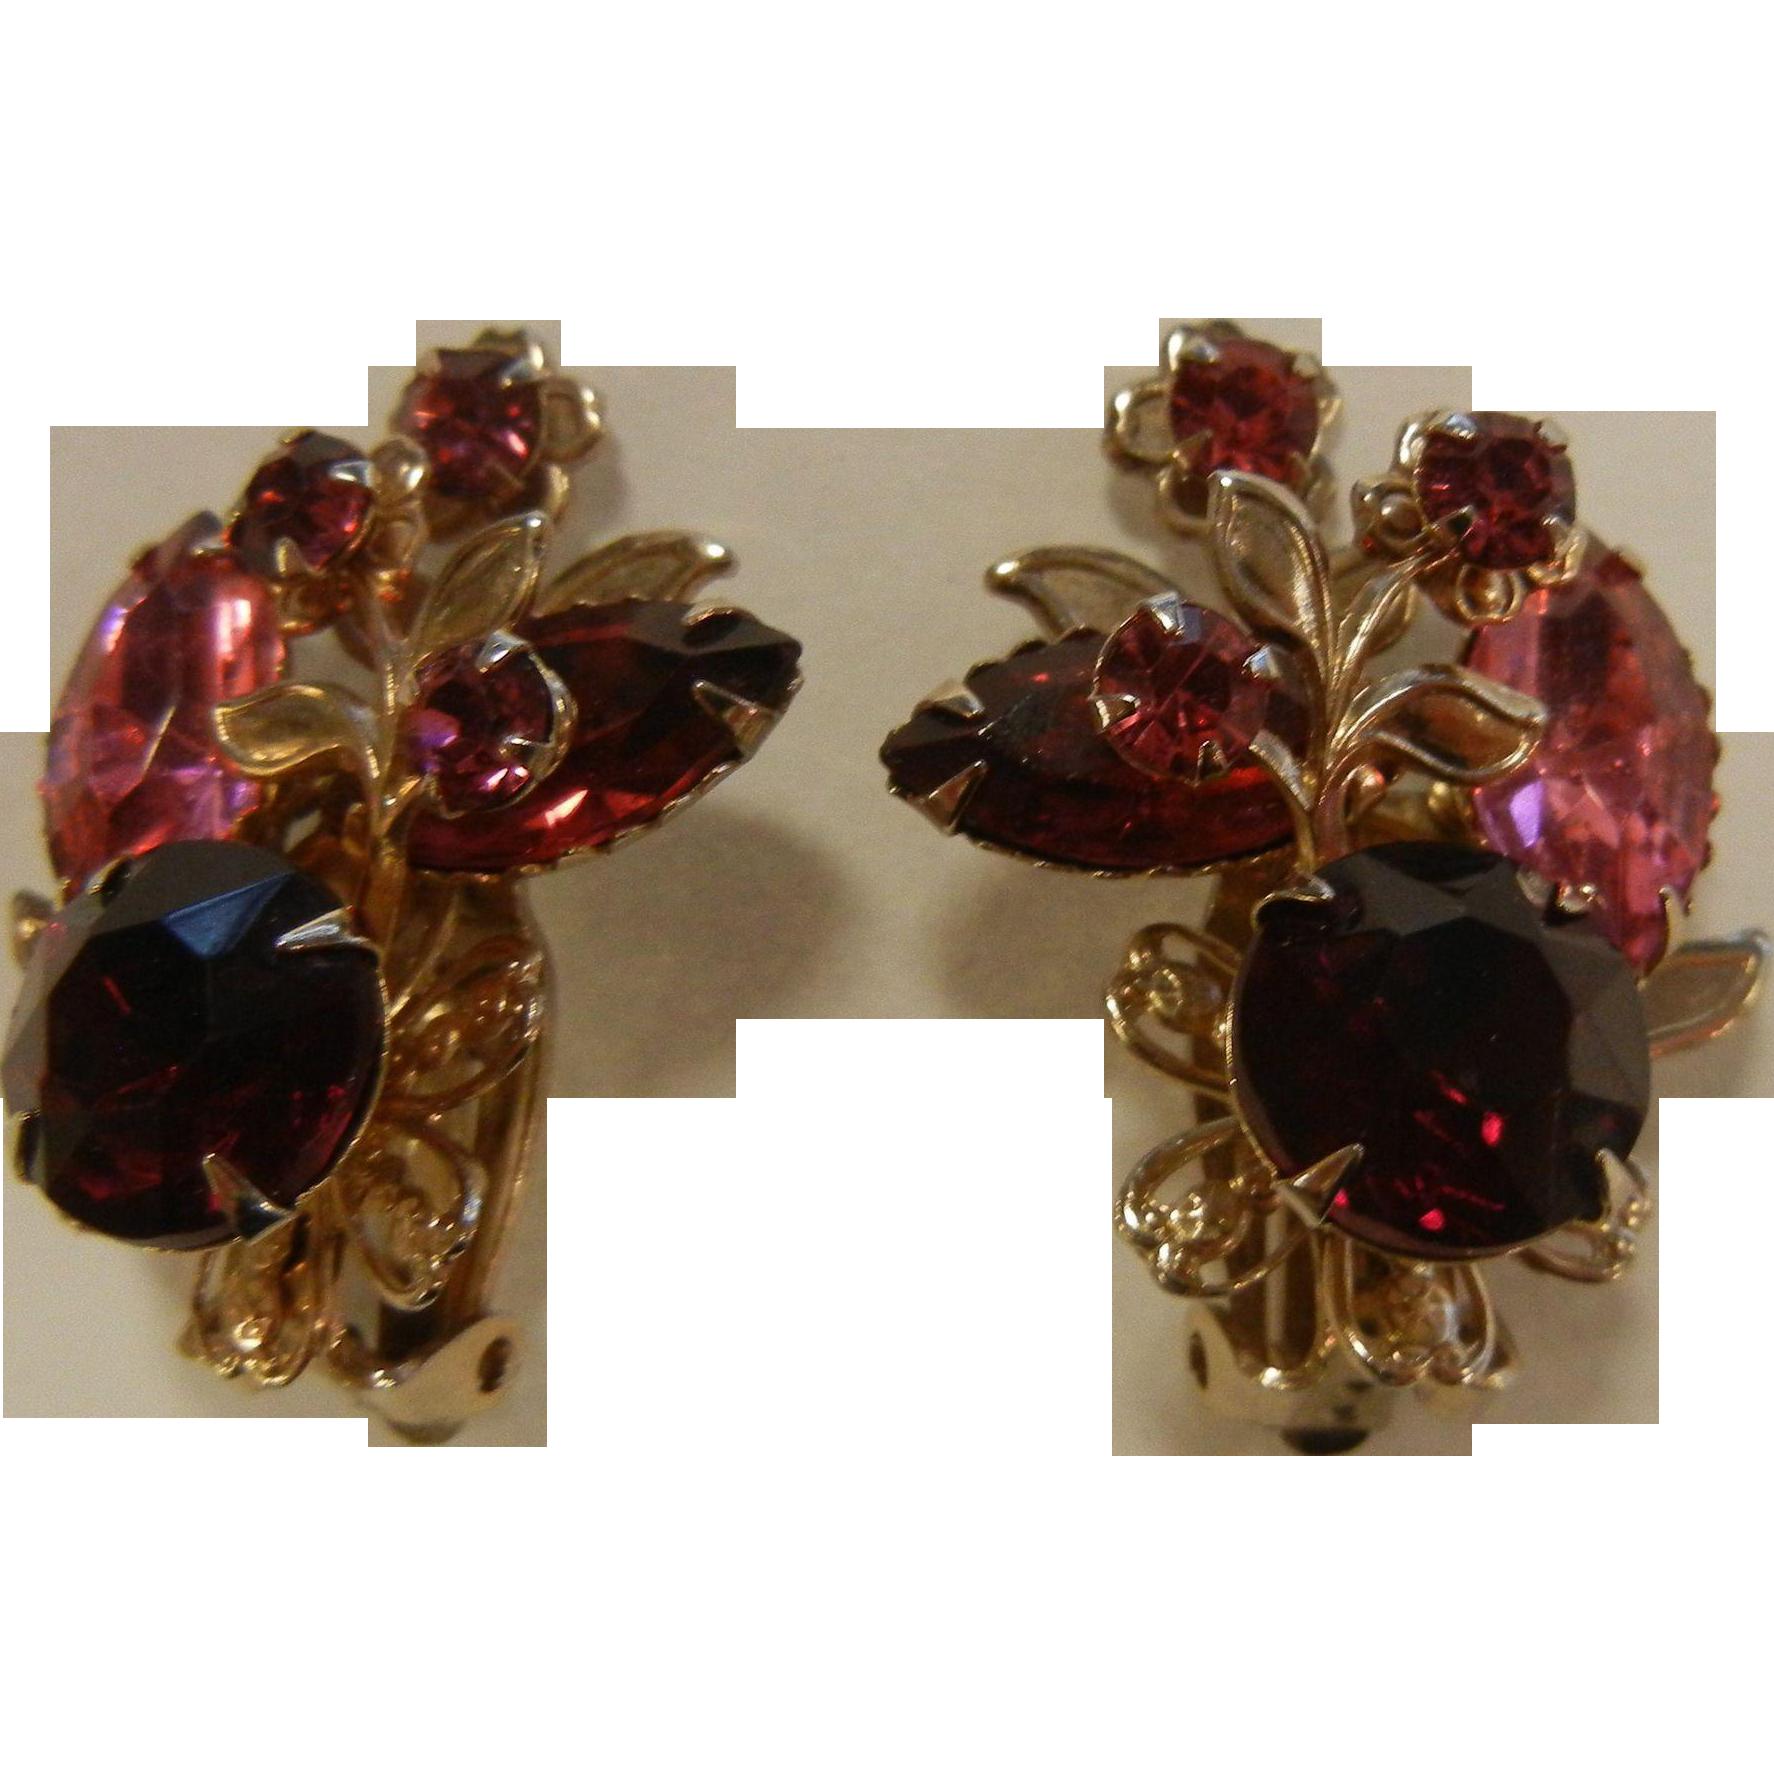 Vintage Costume Jewelry Clip Earrings w/ Pink & Red Rhinestones